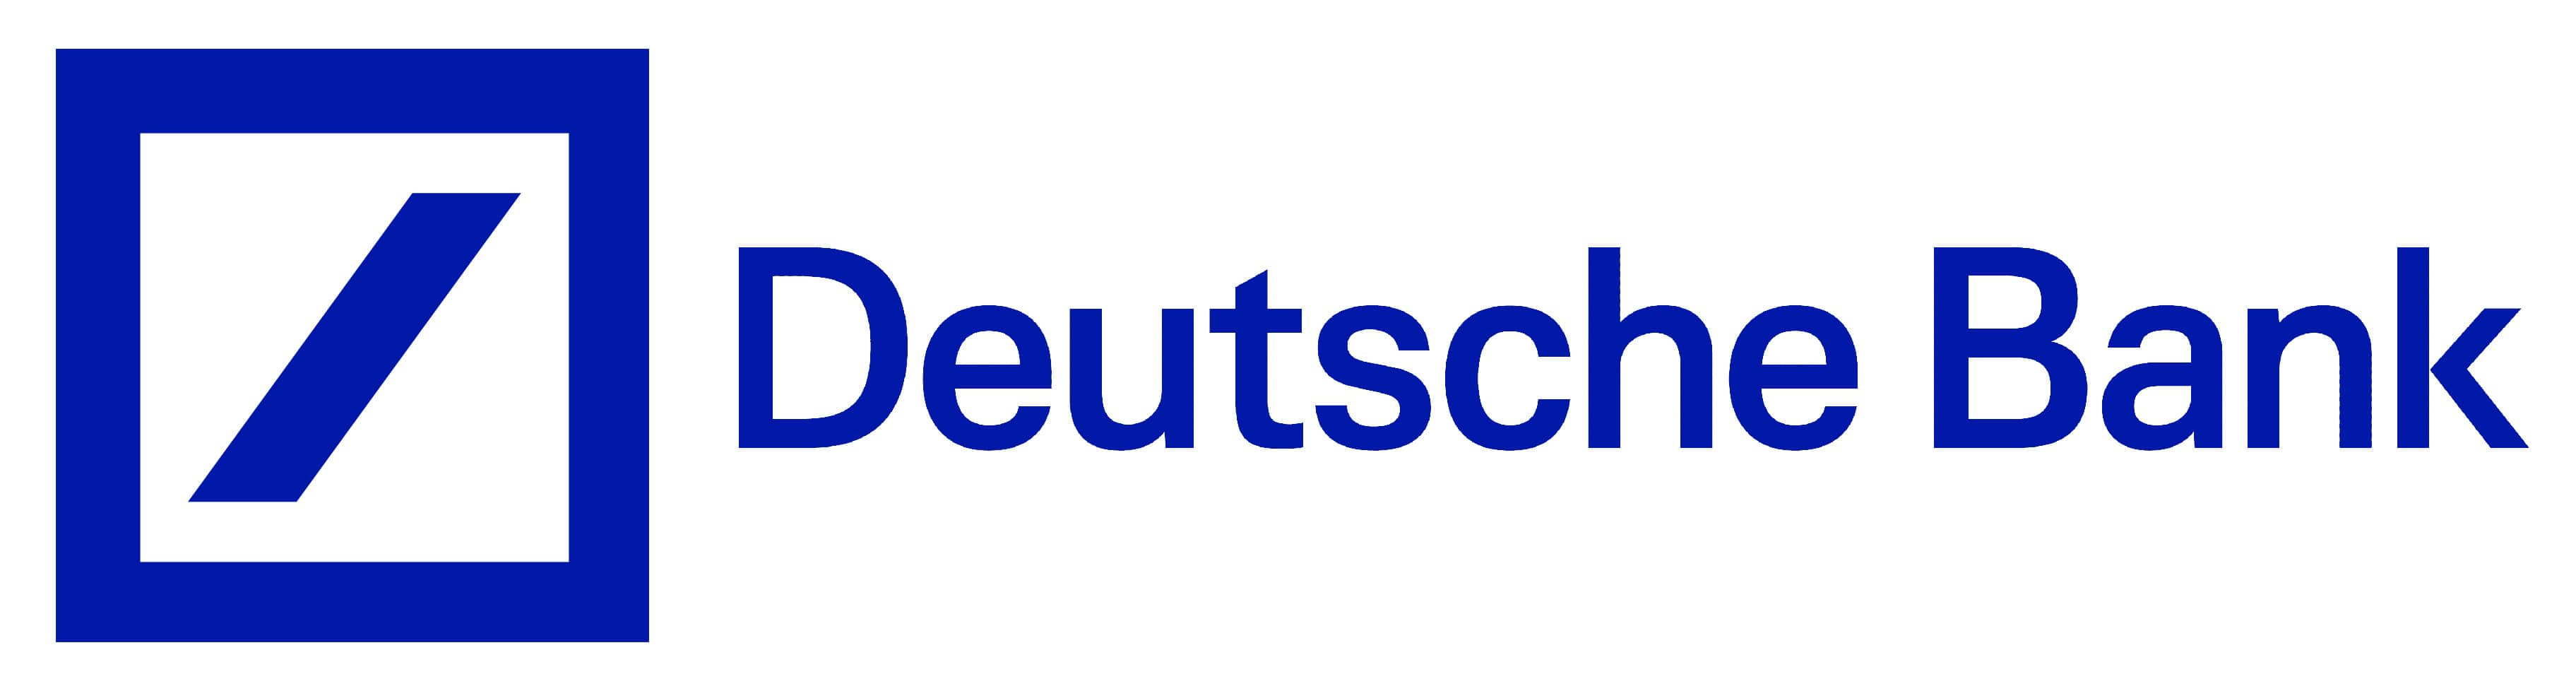 deutsche bank india online banking